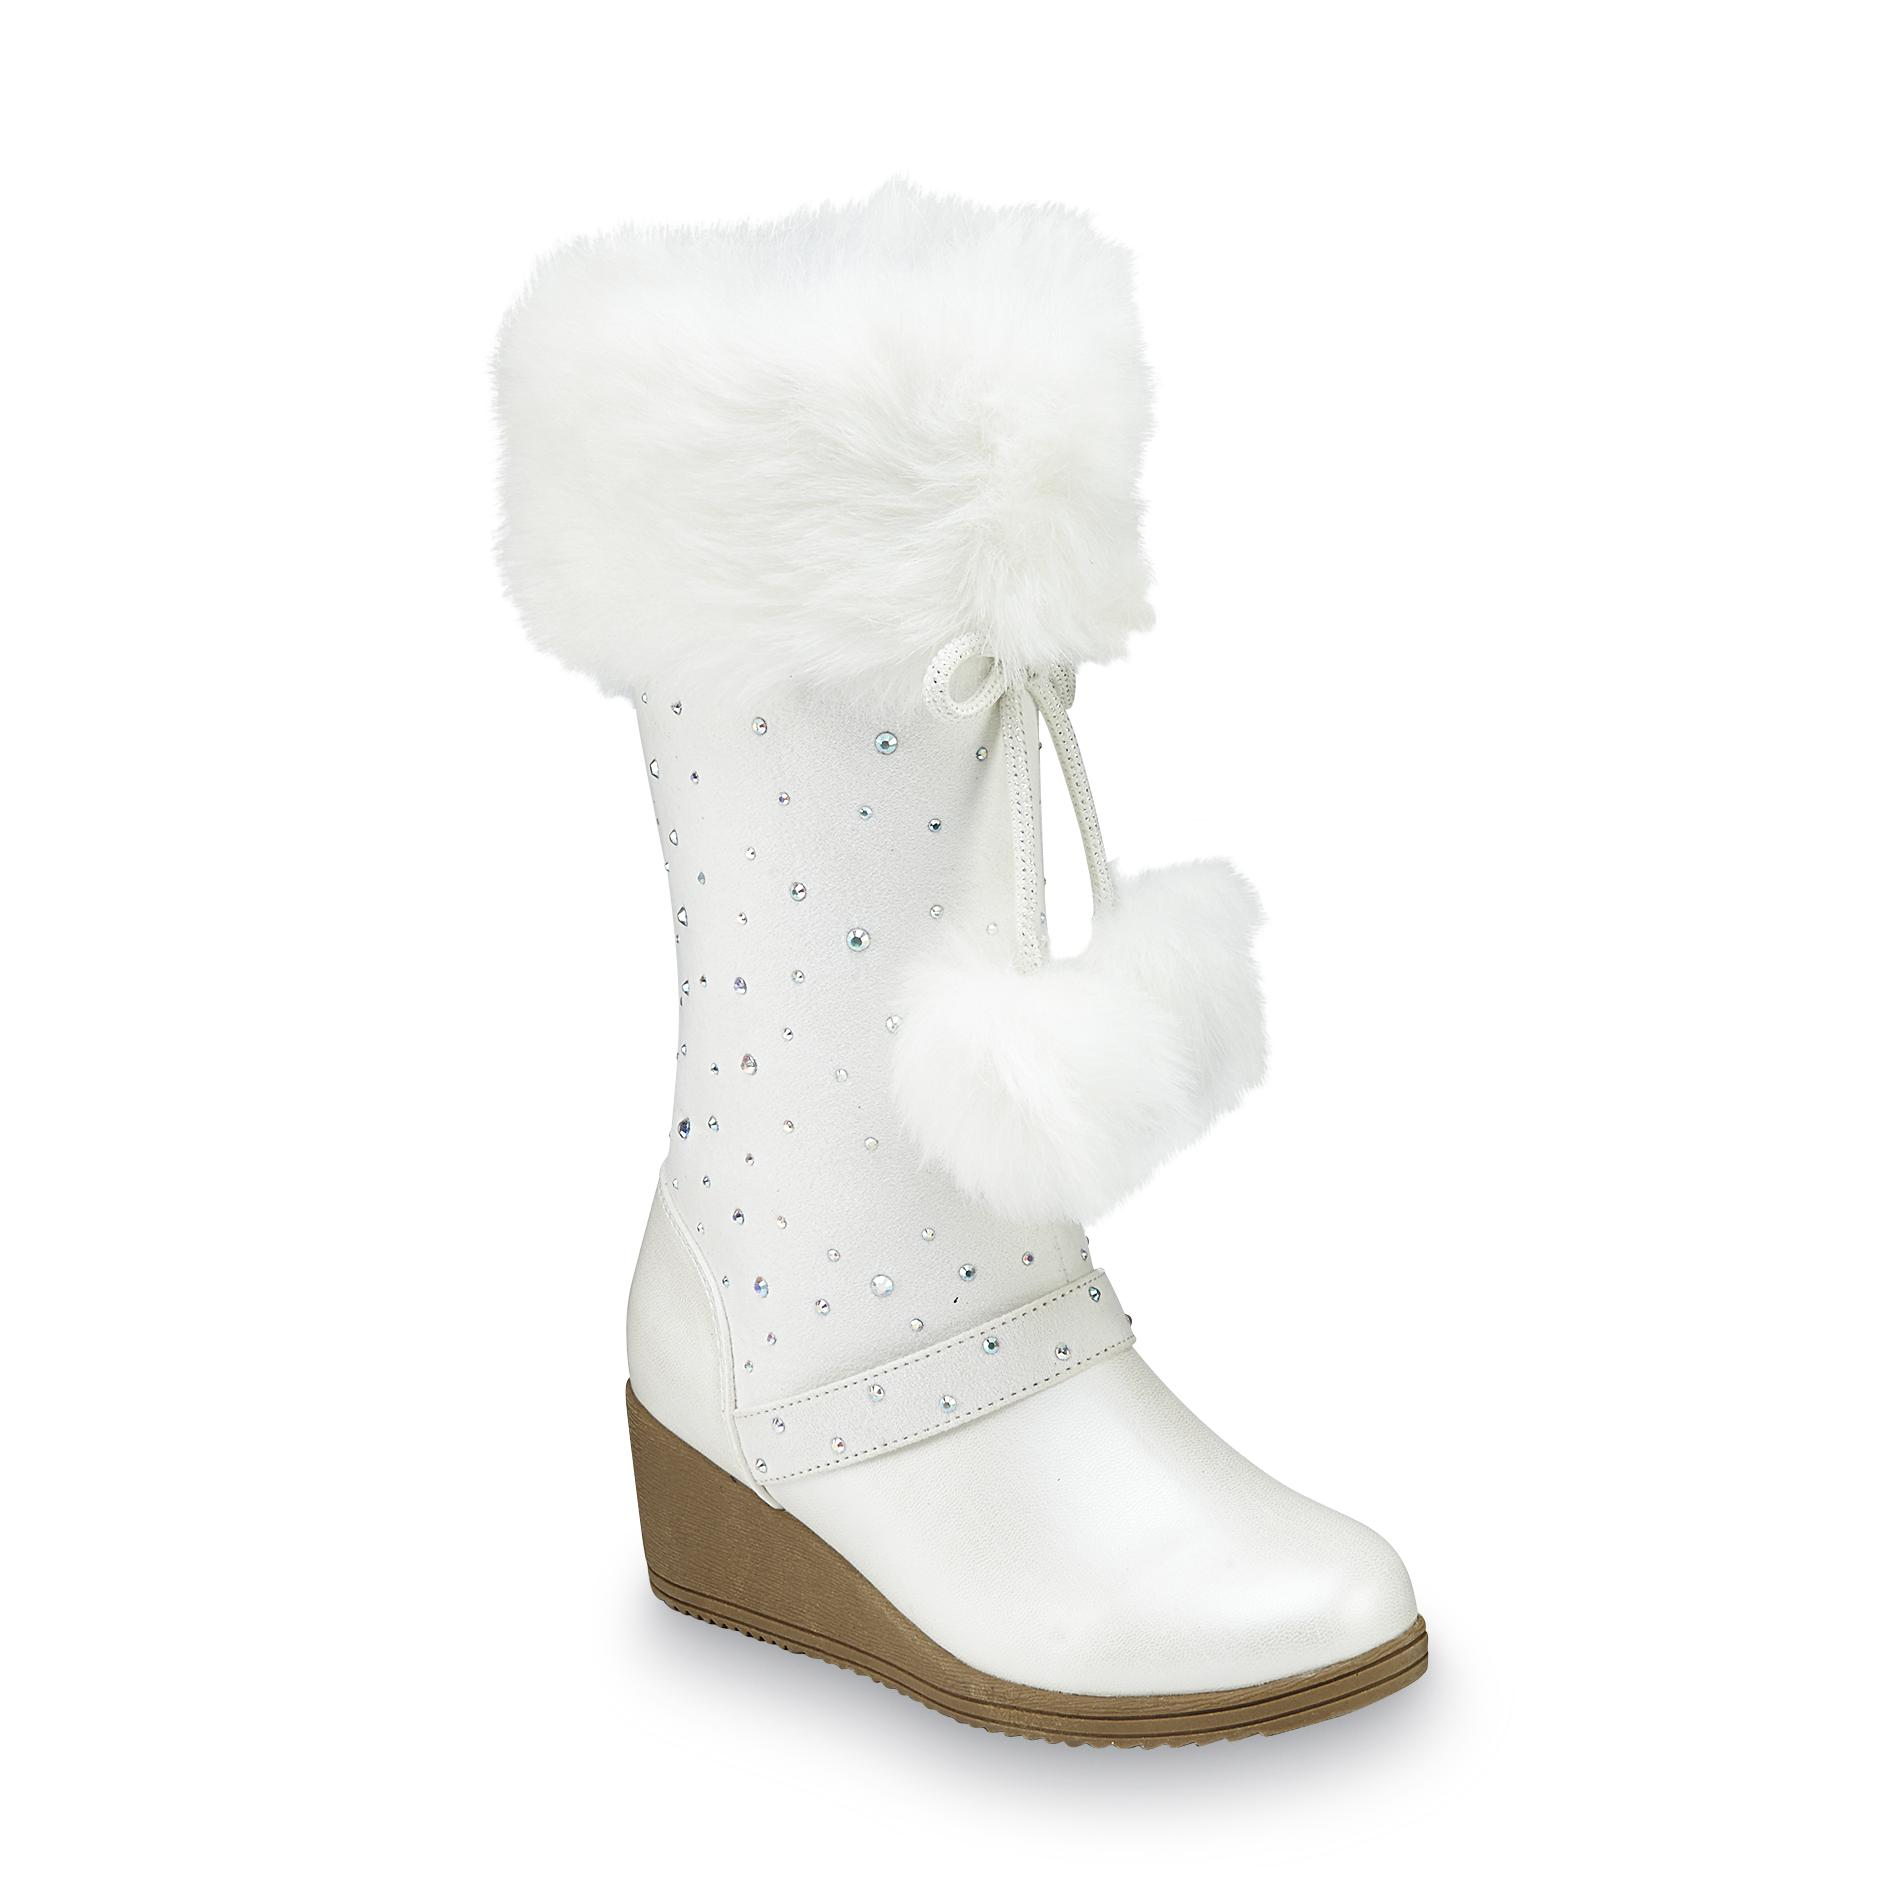 Canyon River Blues Girls Remi White Wedge Boot